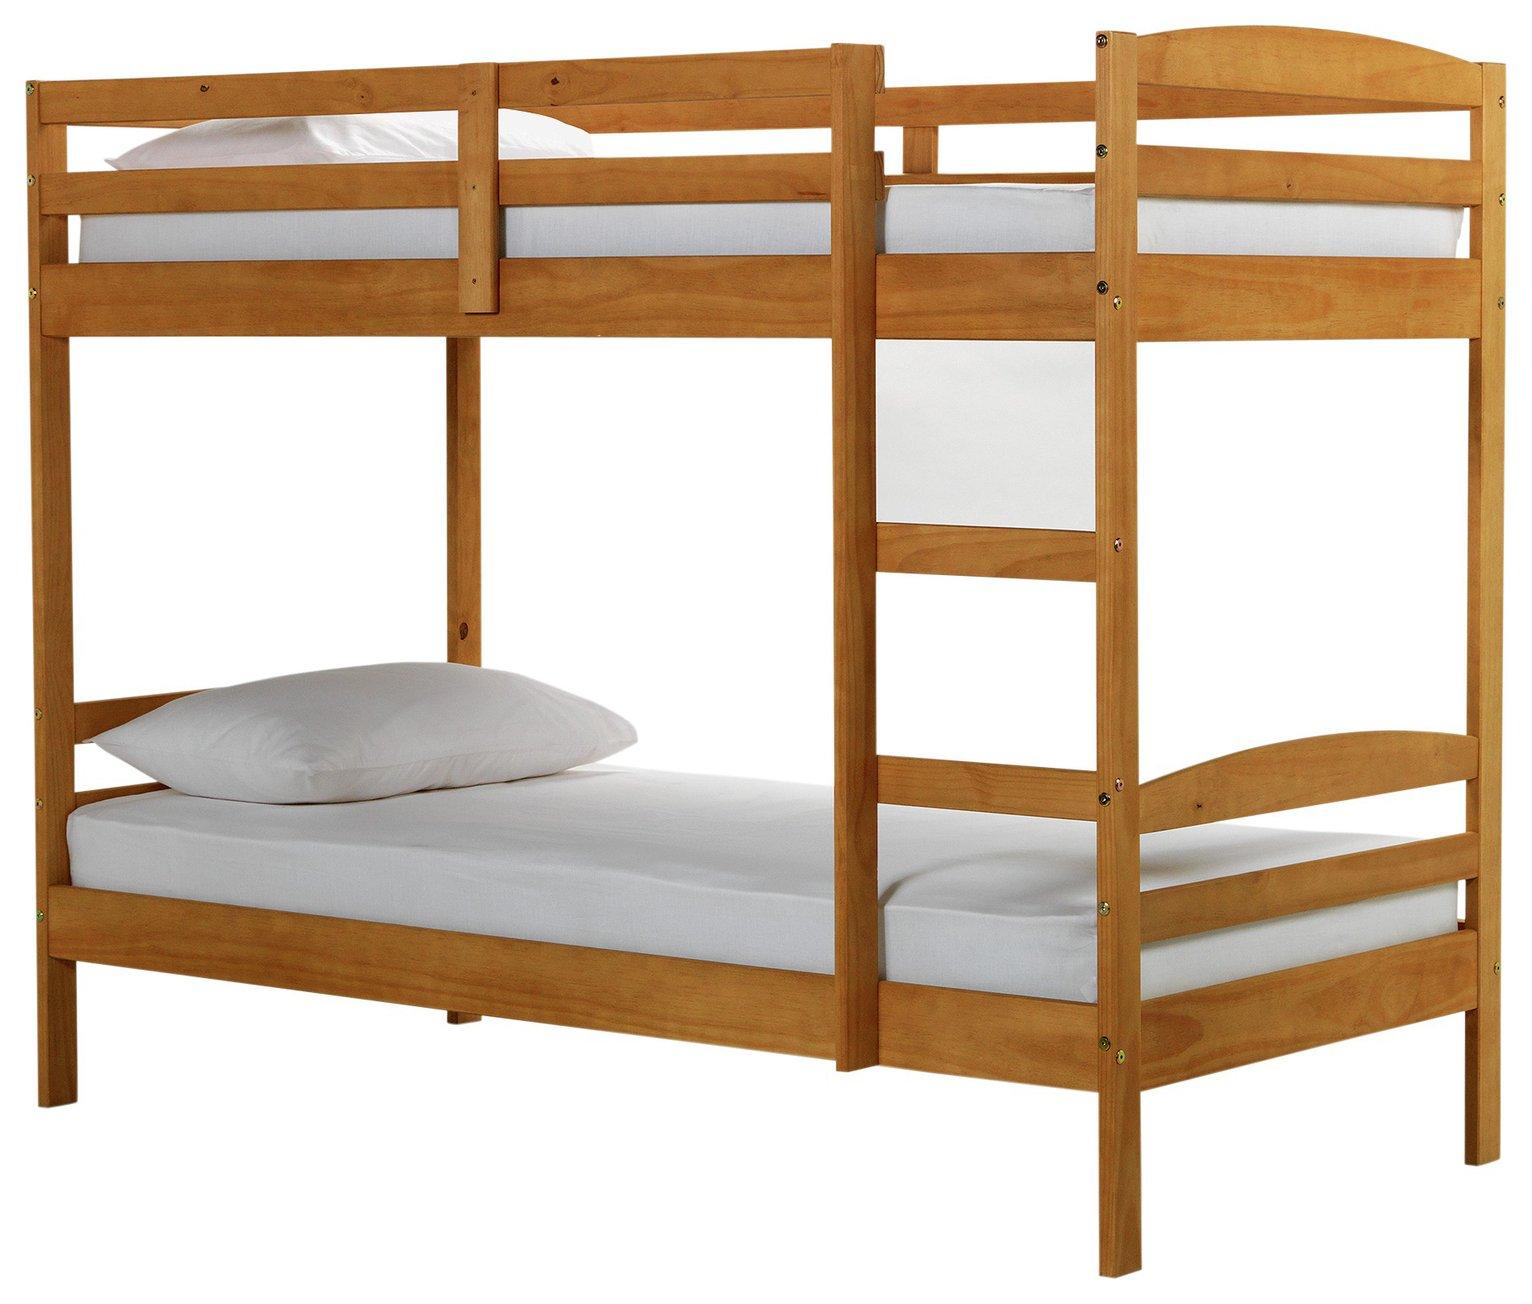 Image of Josie Shorty Bunk Bed with 2 Elliott Mattresses - Pine